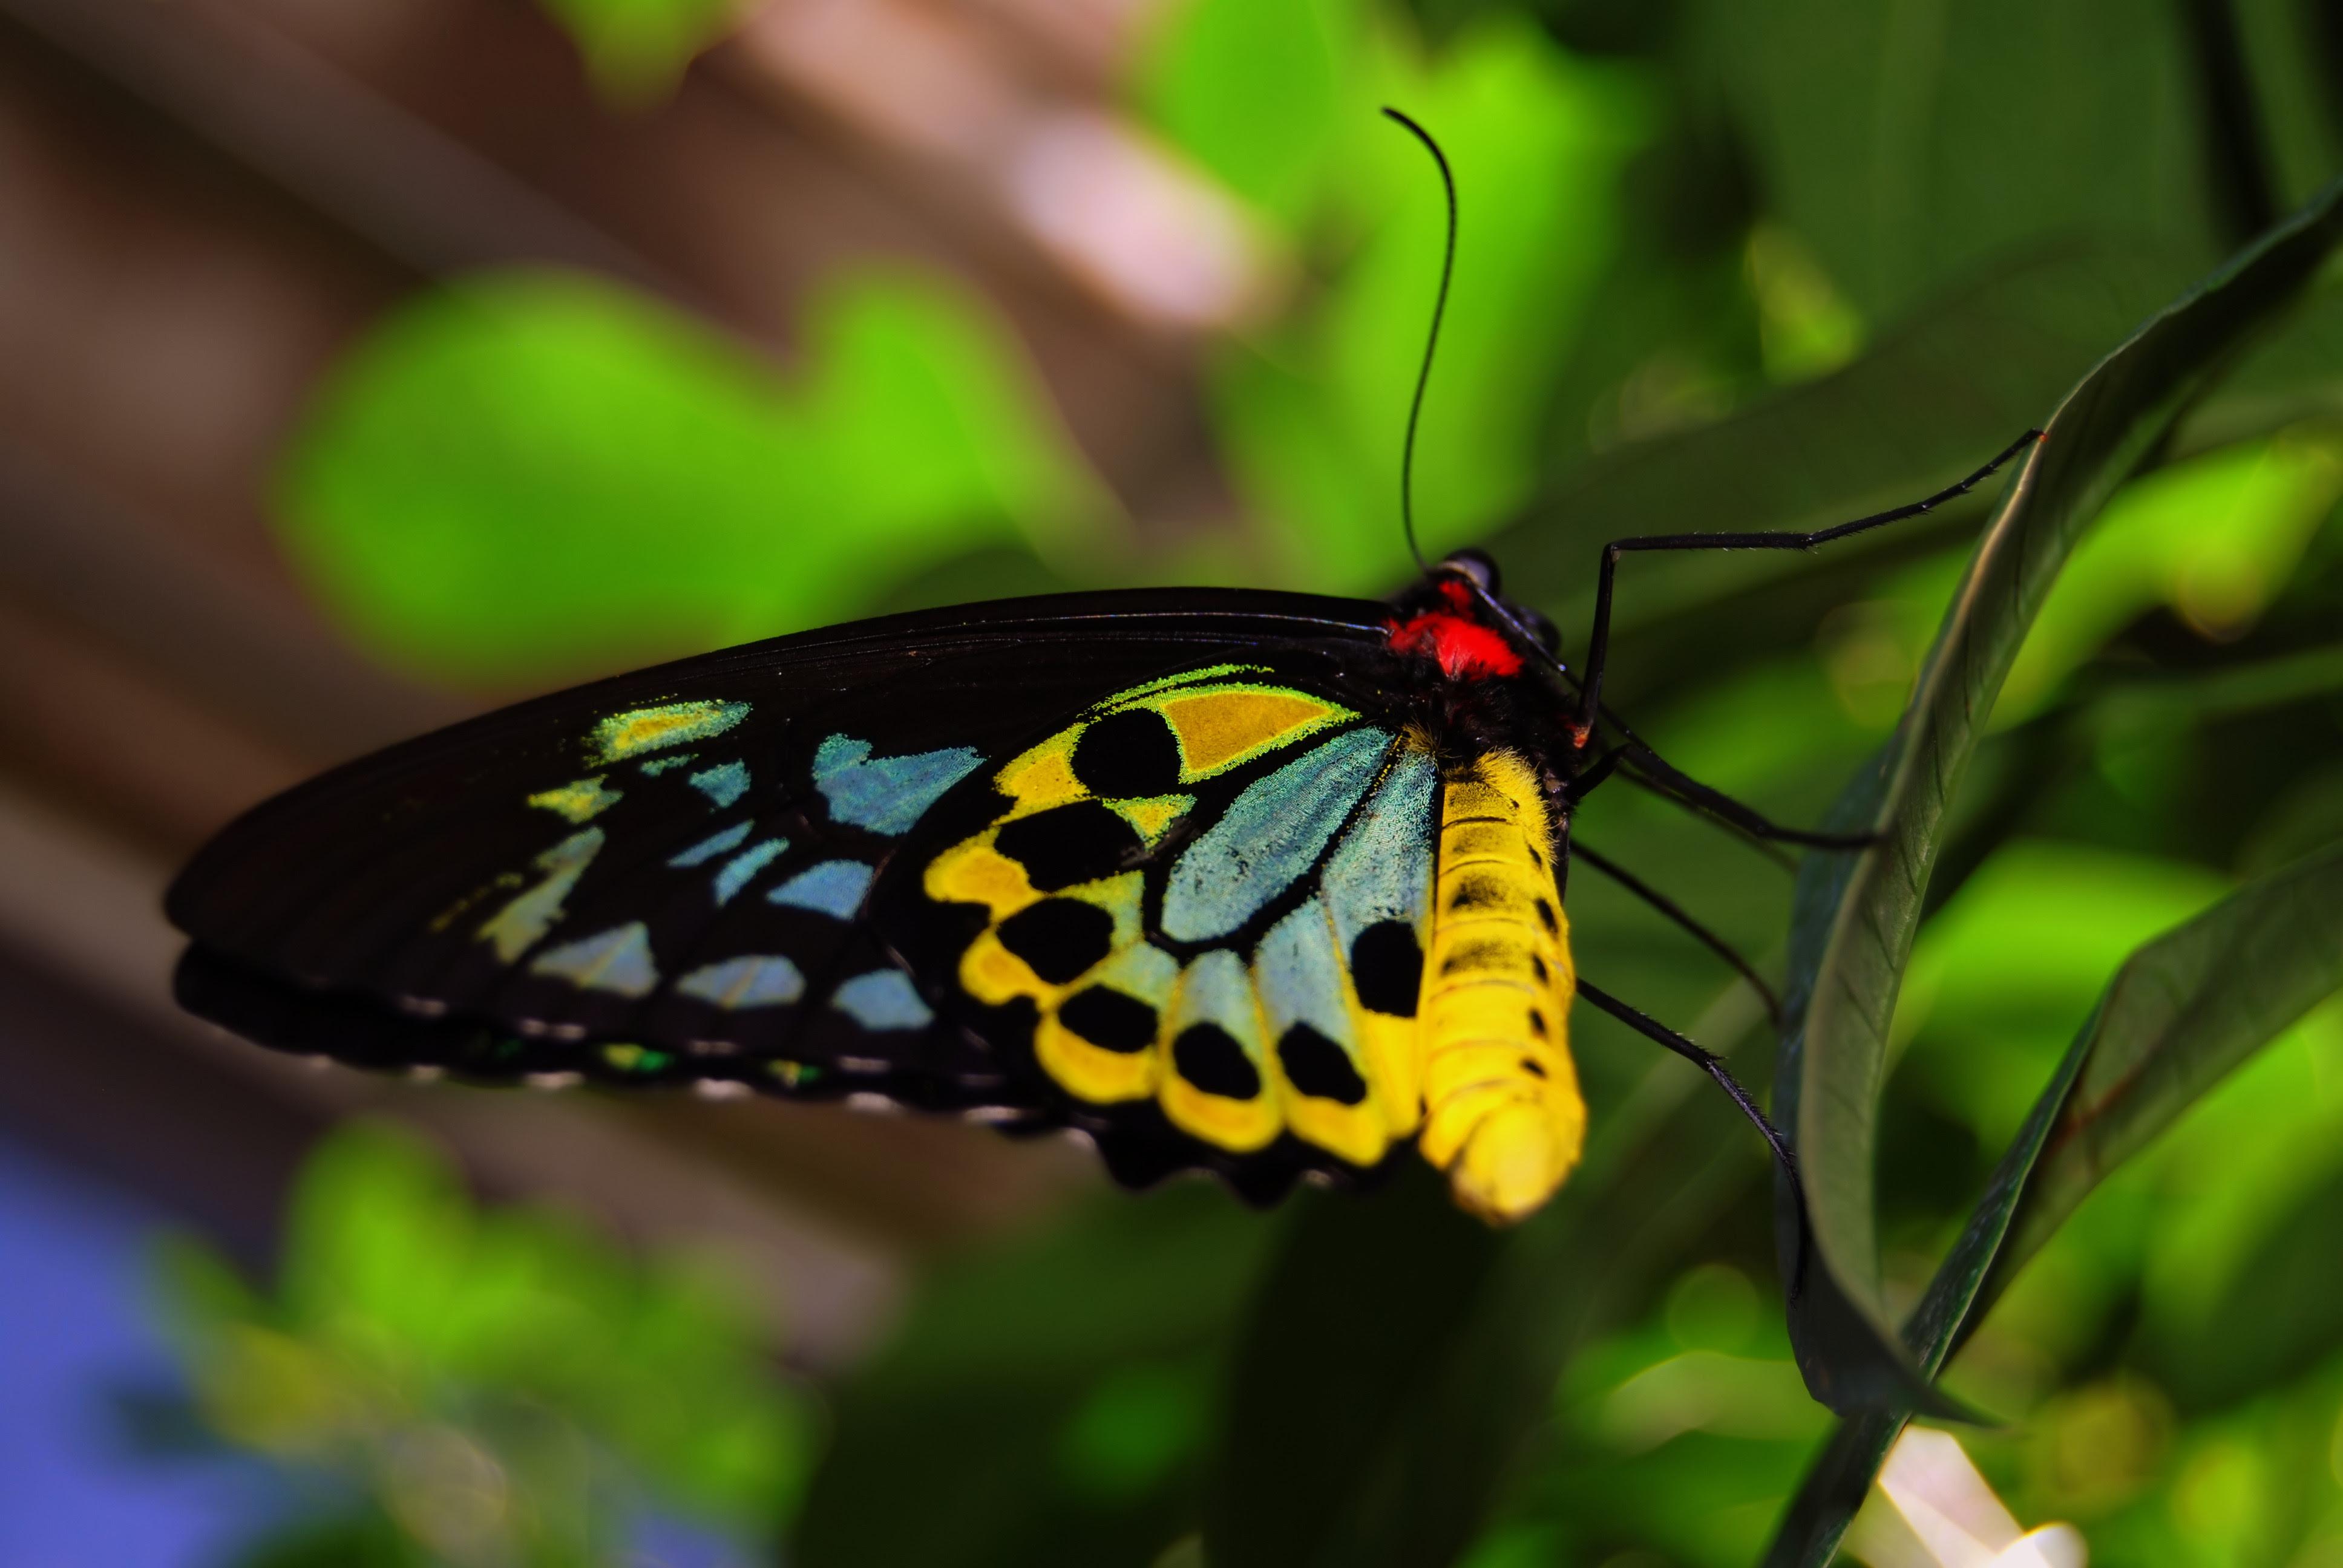 Colorful Butterfly Wallpaper - WallpaperSafari